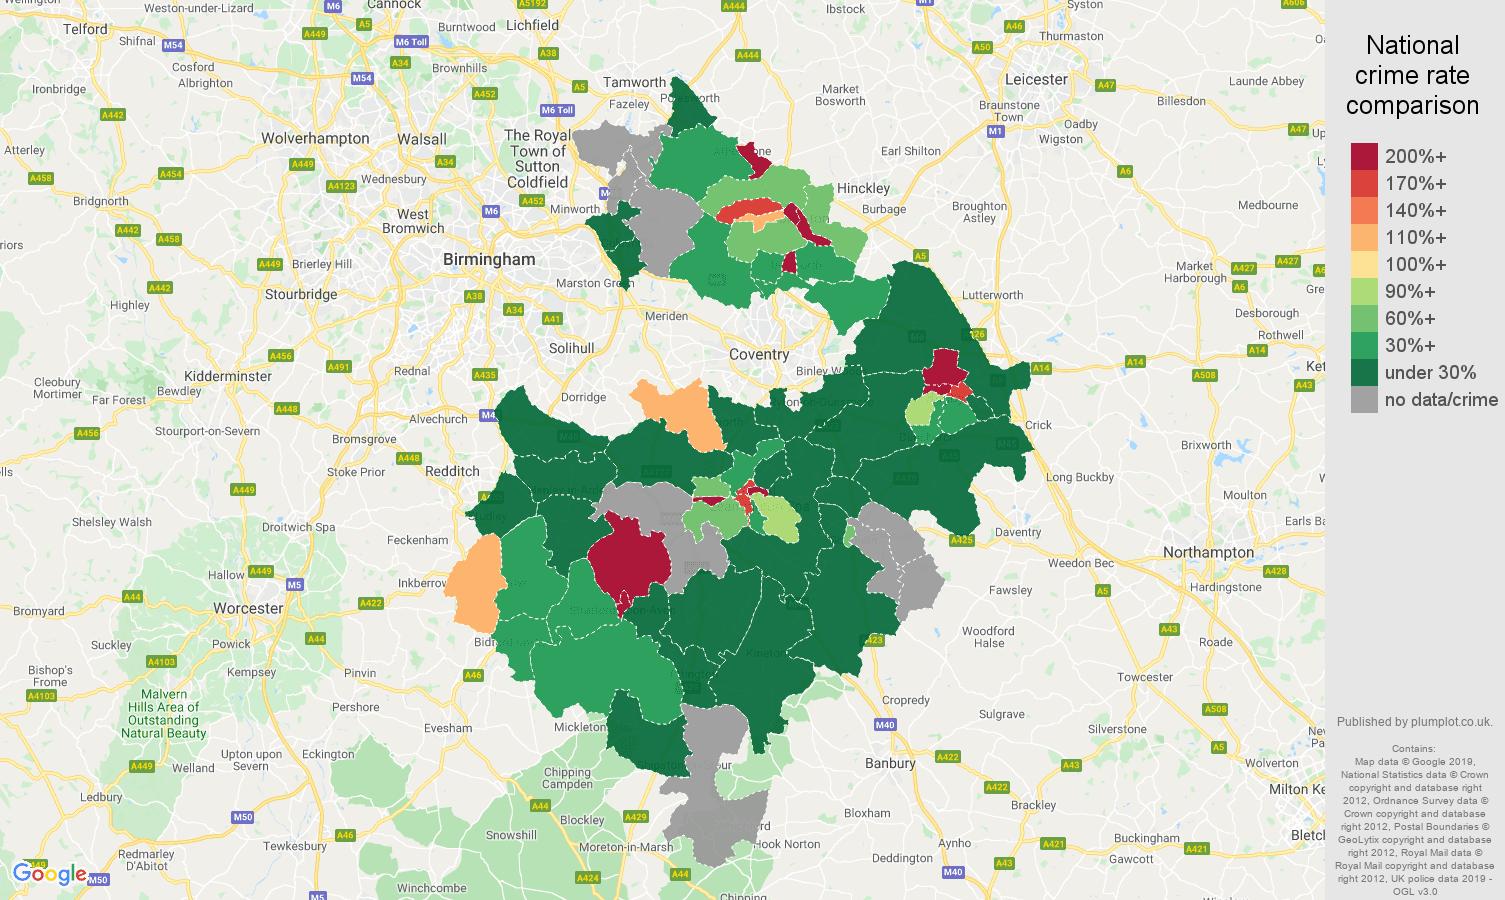 Warwickshire shoplifting crime rate comparison map